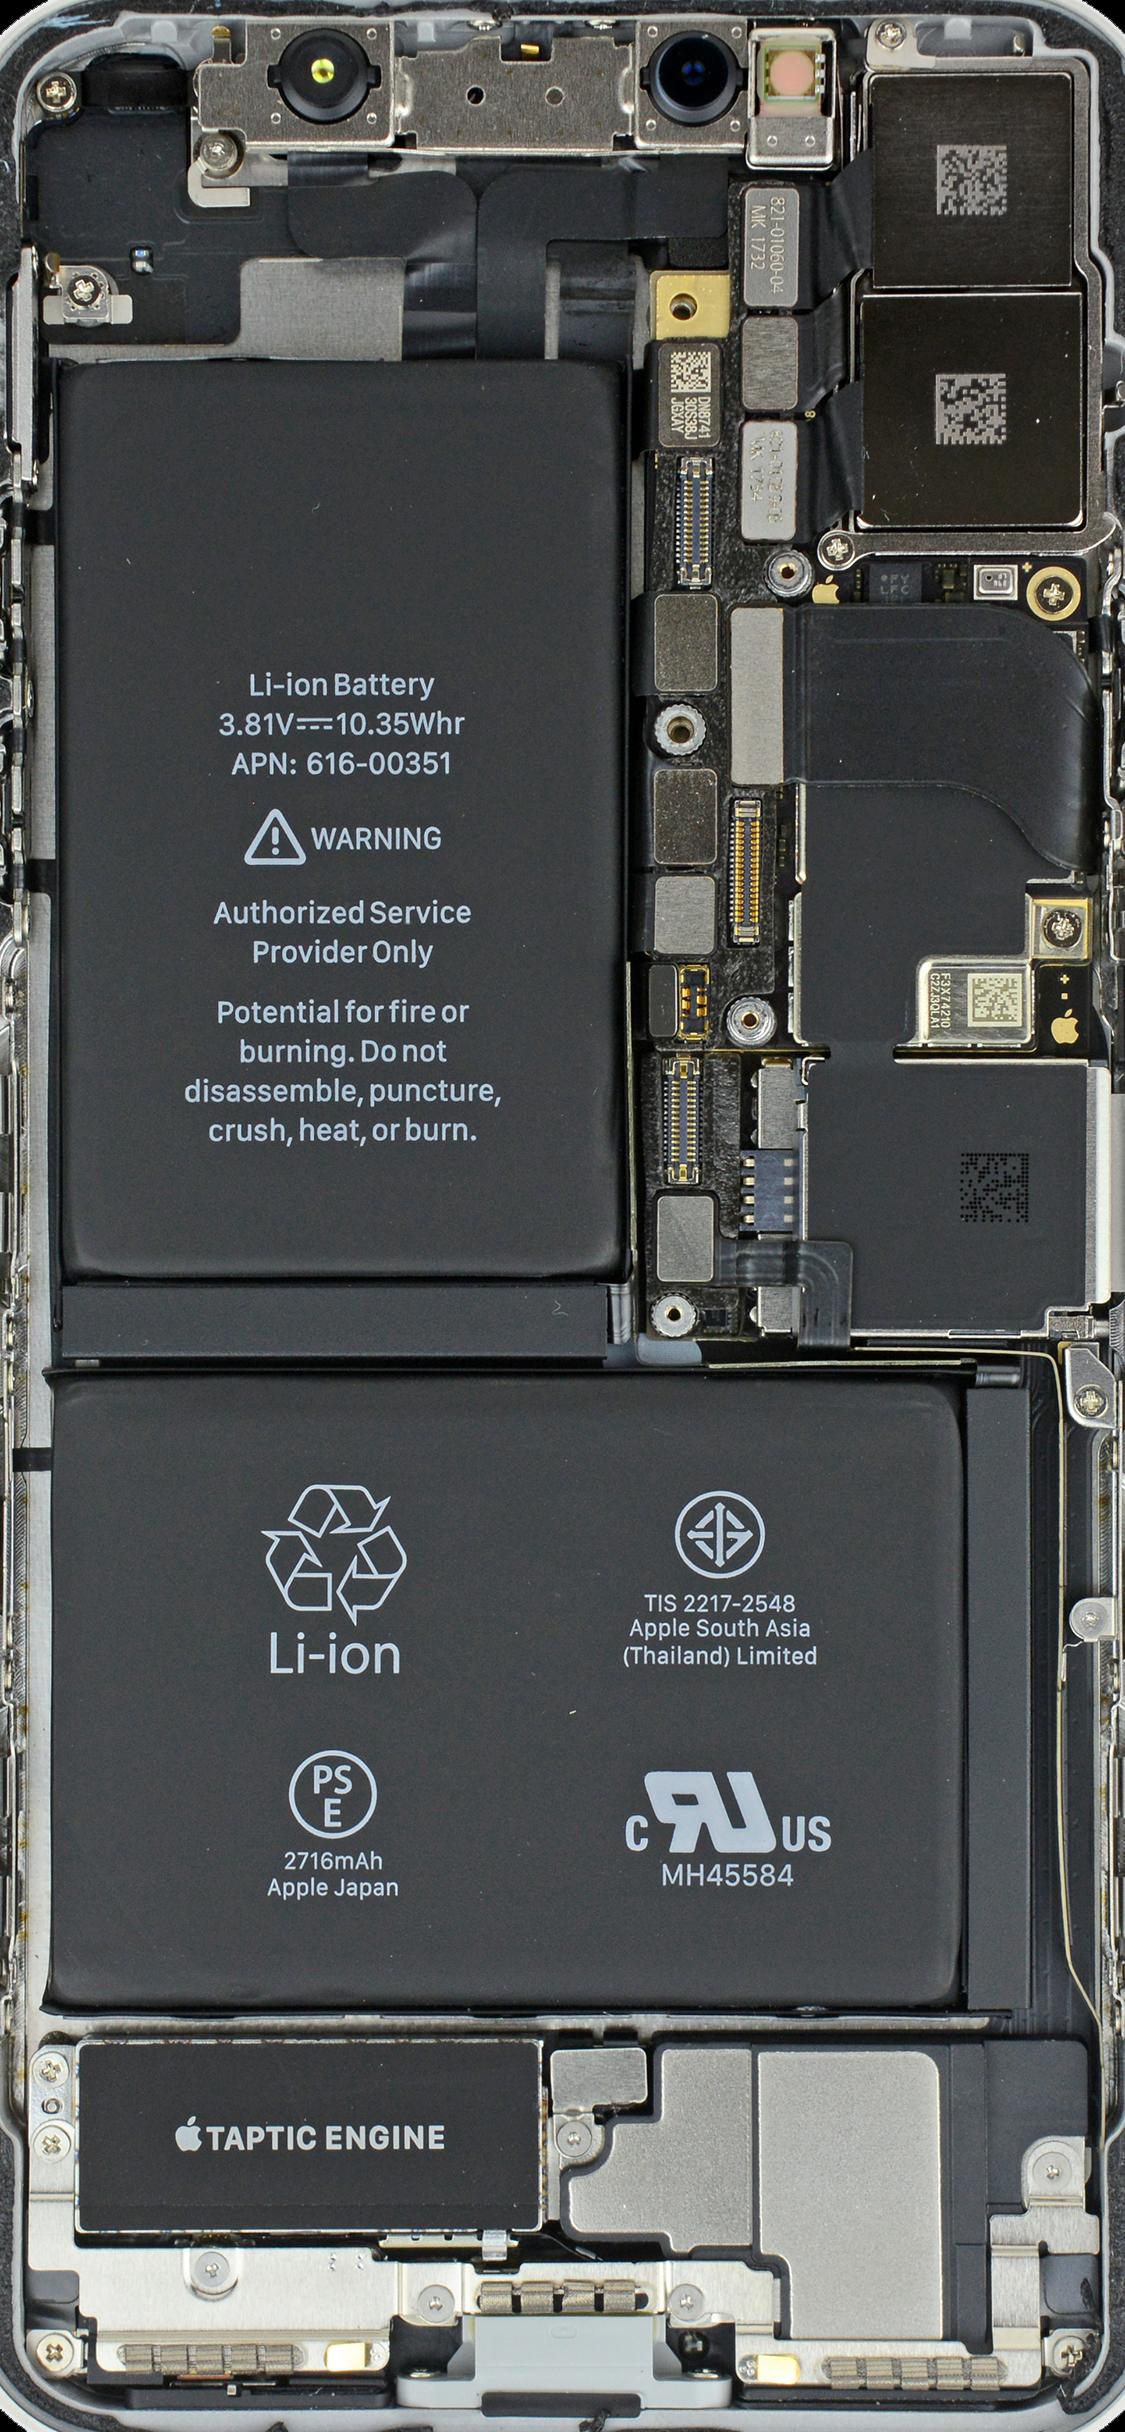 Iphone Xの中身が丸見え スケルトン化しちゃう壁紙が公開されたぞ